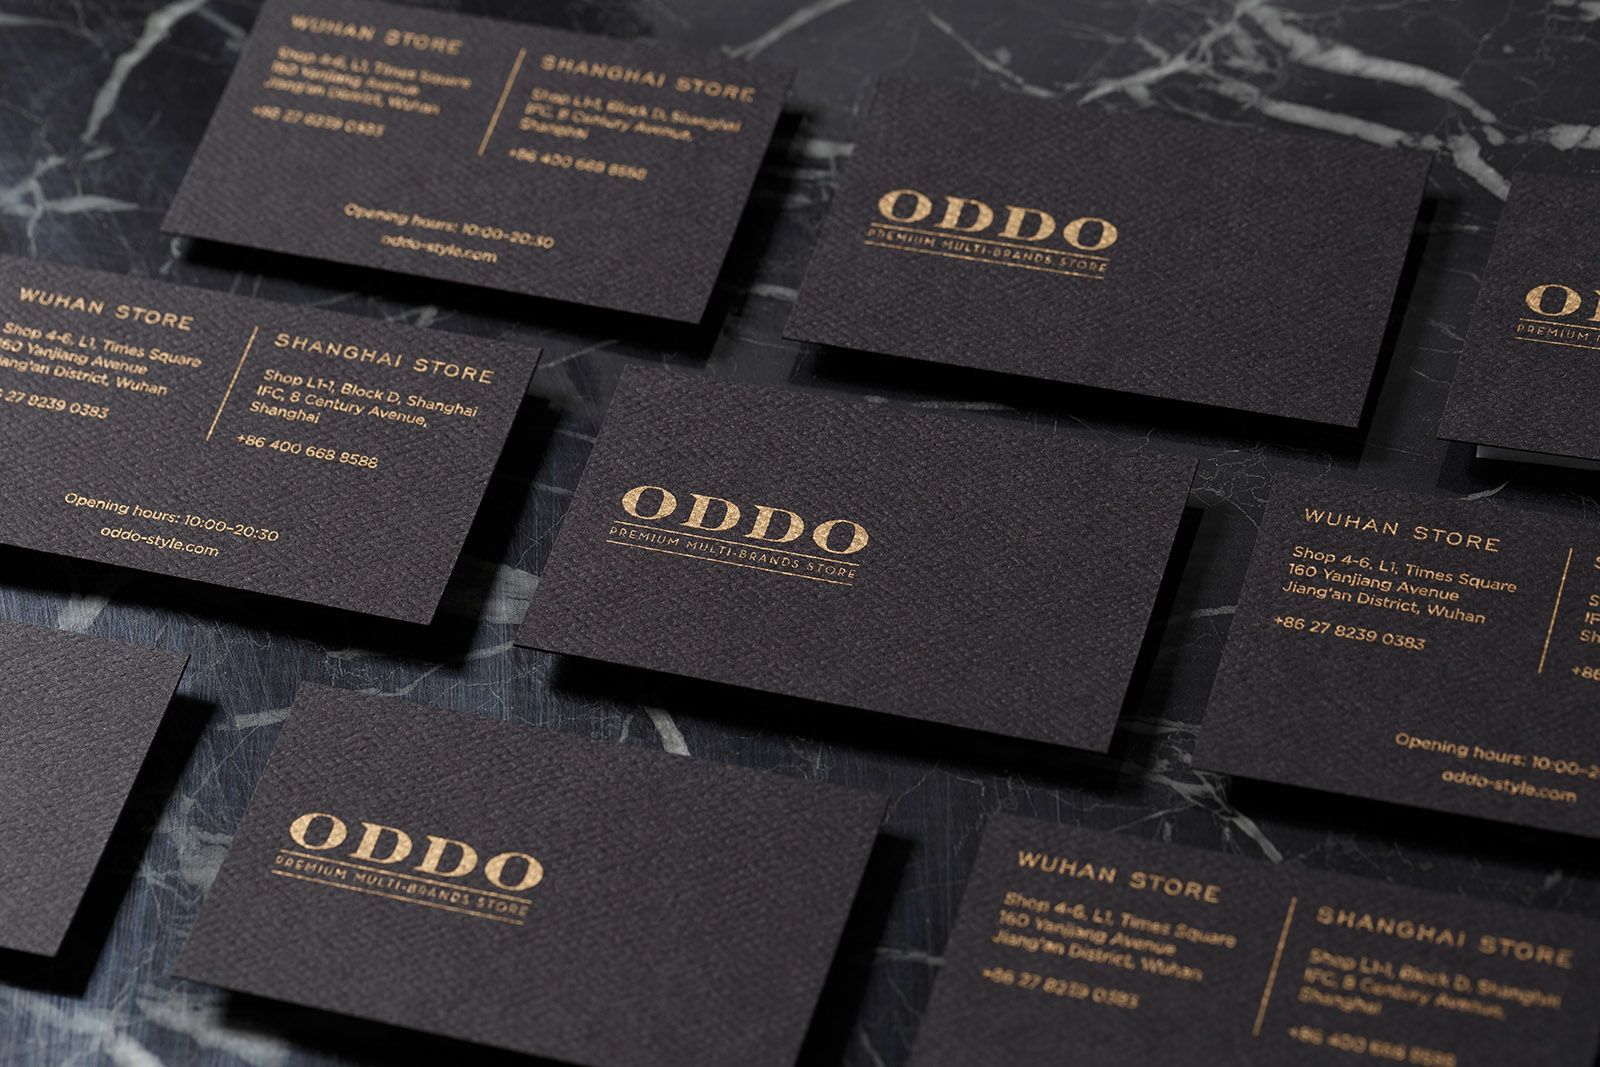 ODDO is a Multi-Brand Concept Store that offers Designer Menswear ...